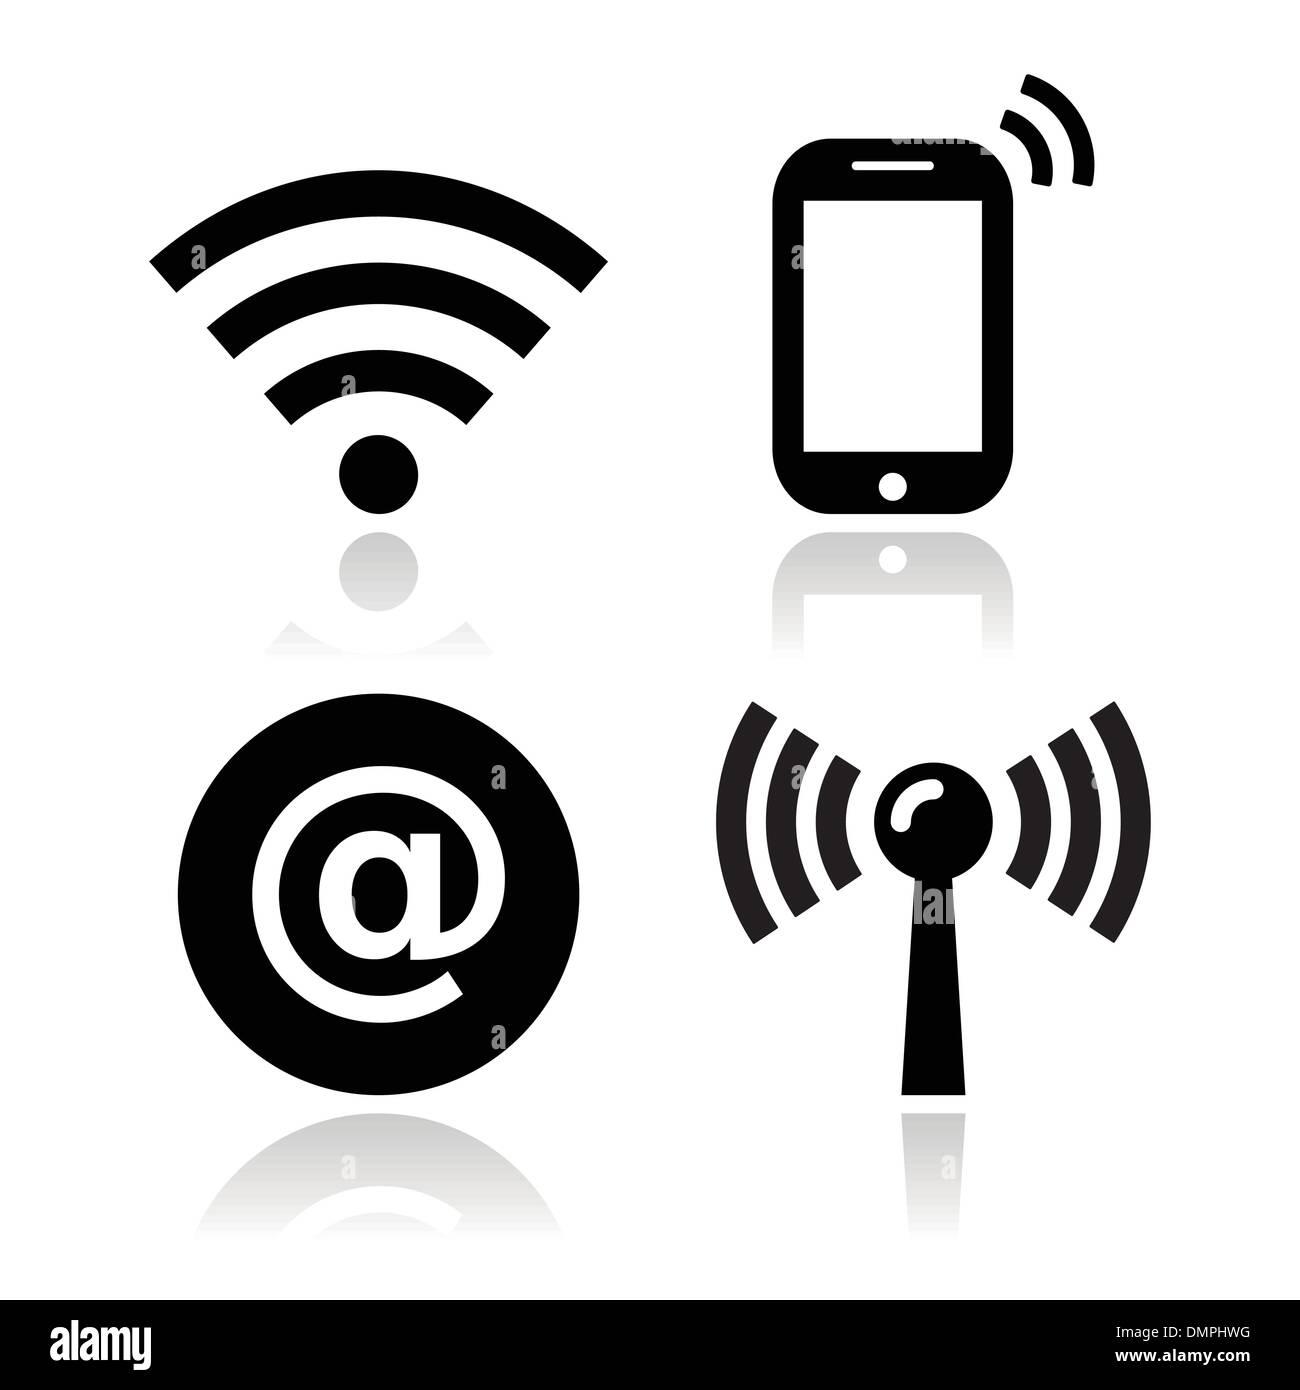 Wifi network, internet zone icons set - Stock Image